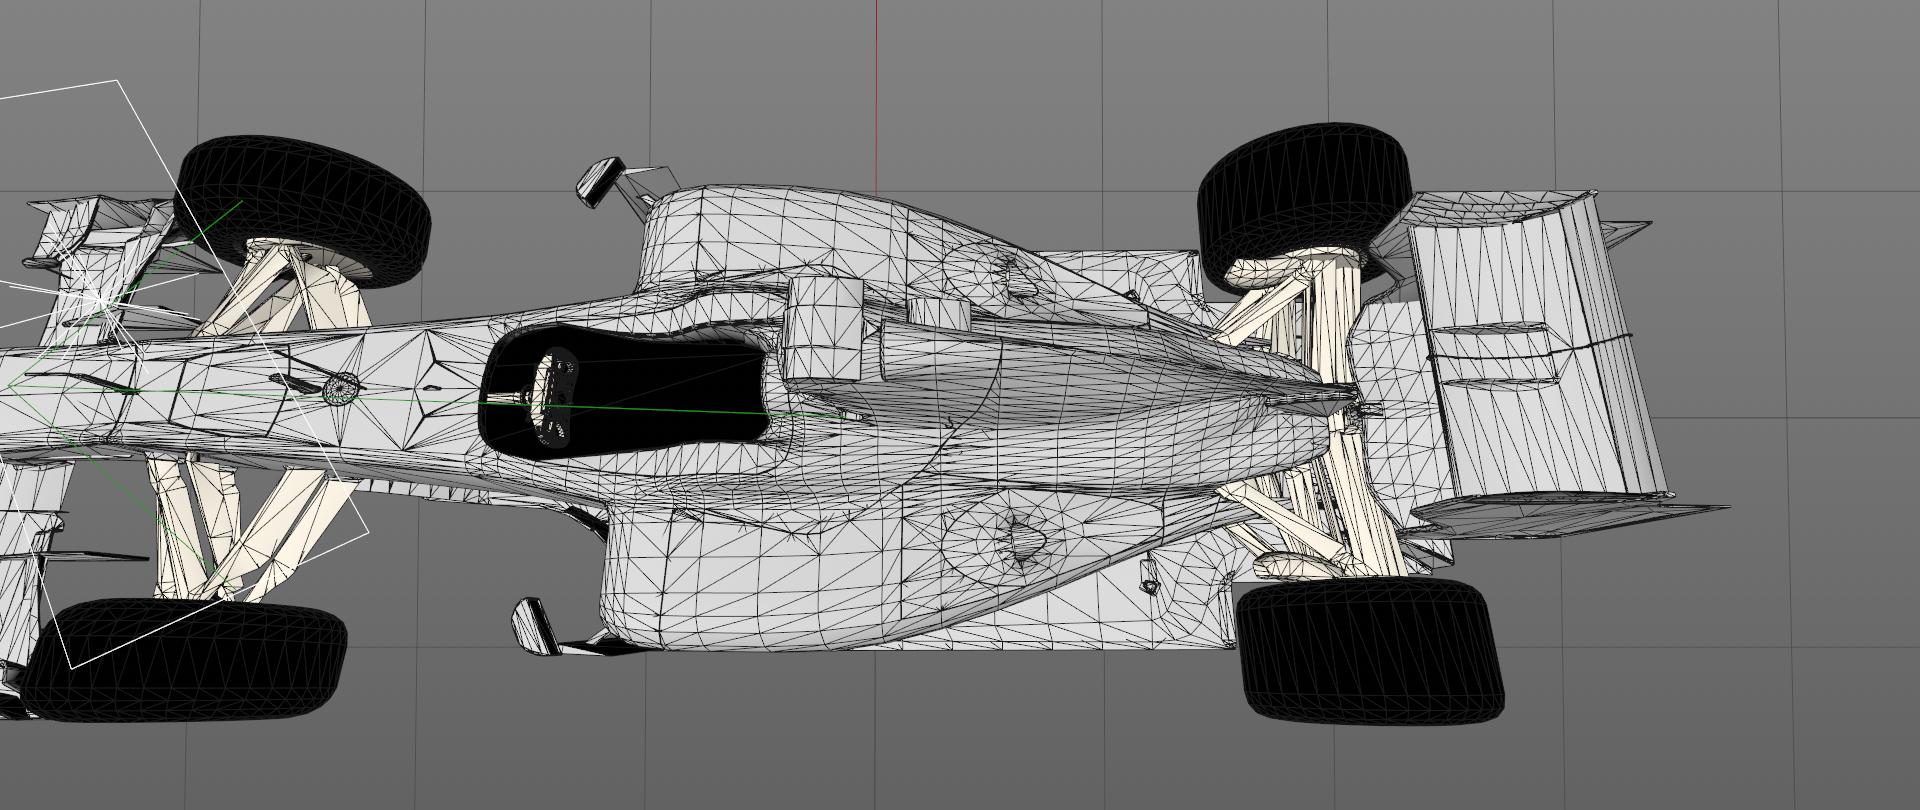 F1 Trophy Look Development.00_00_11_20.Still076.jpg